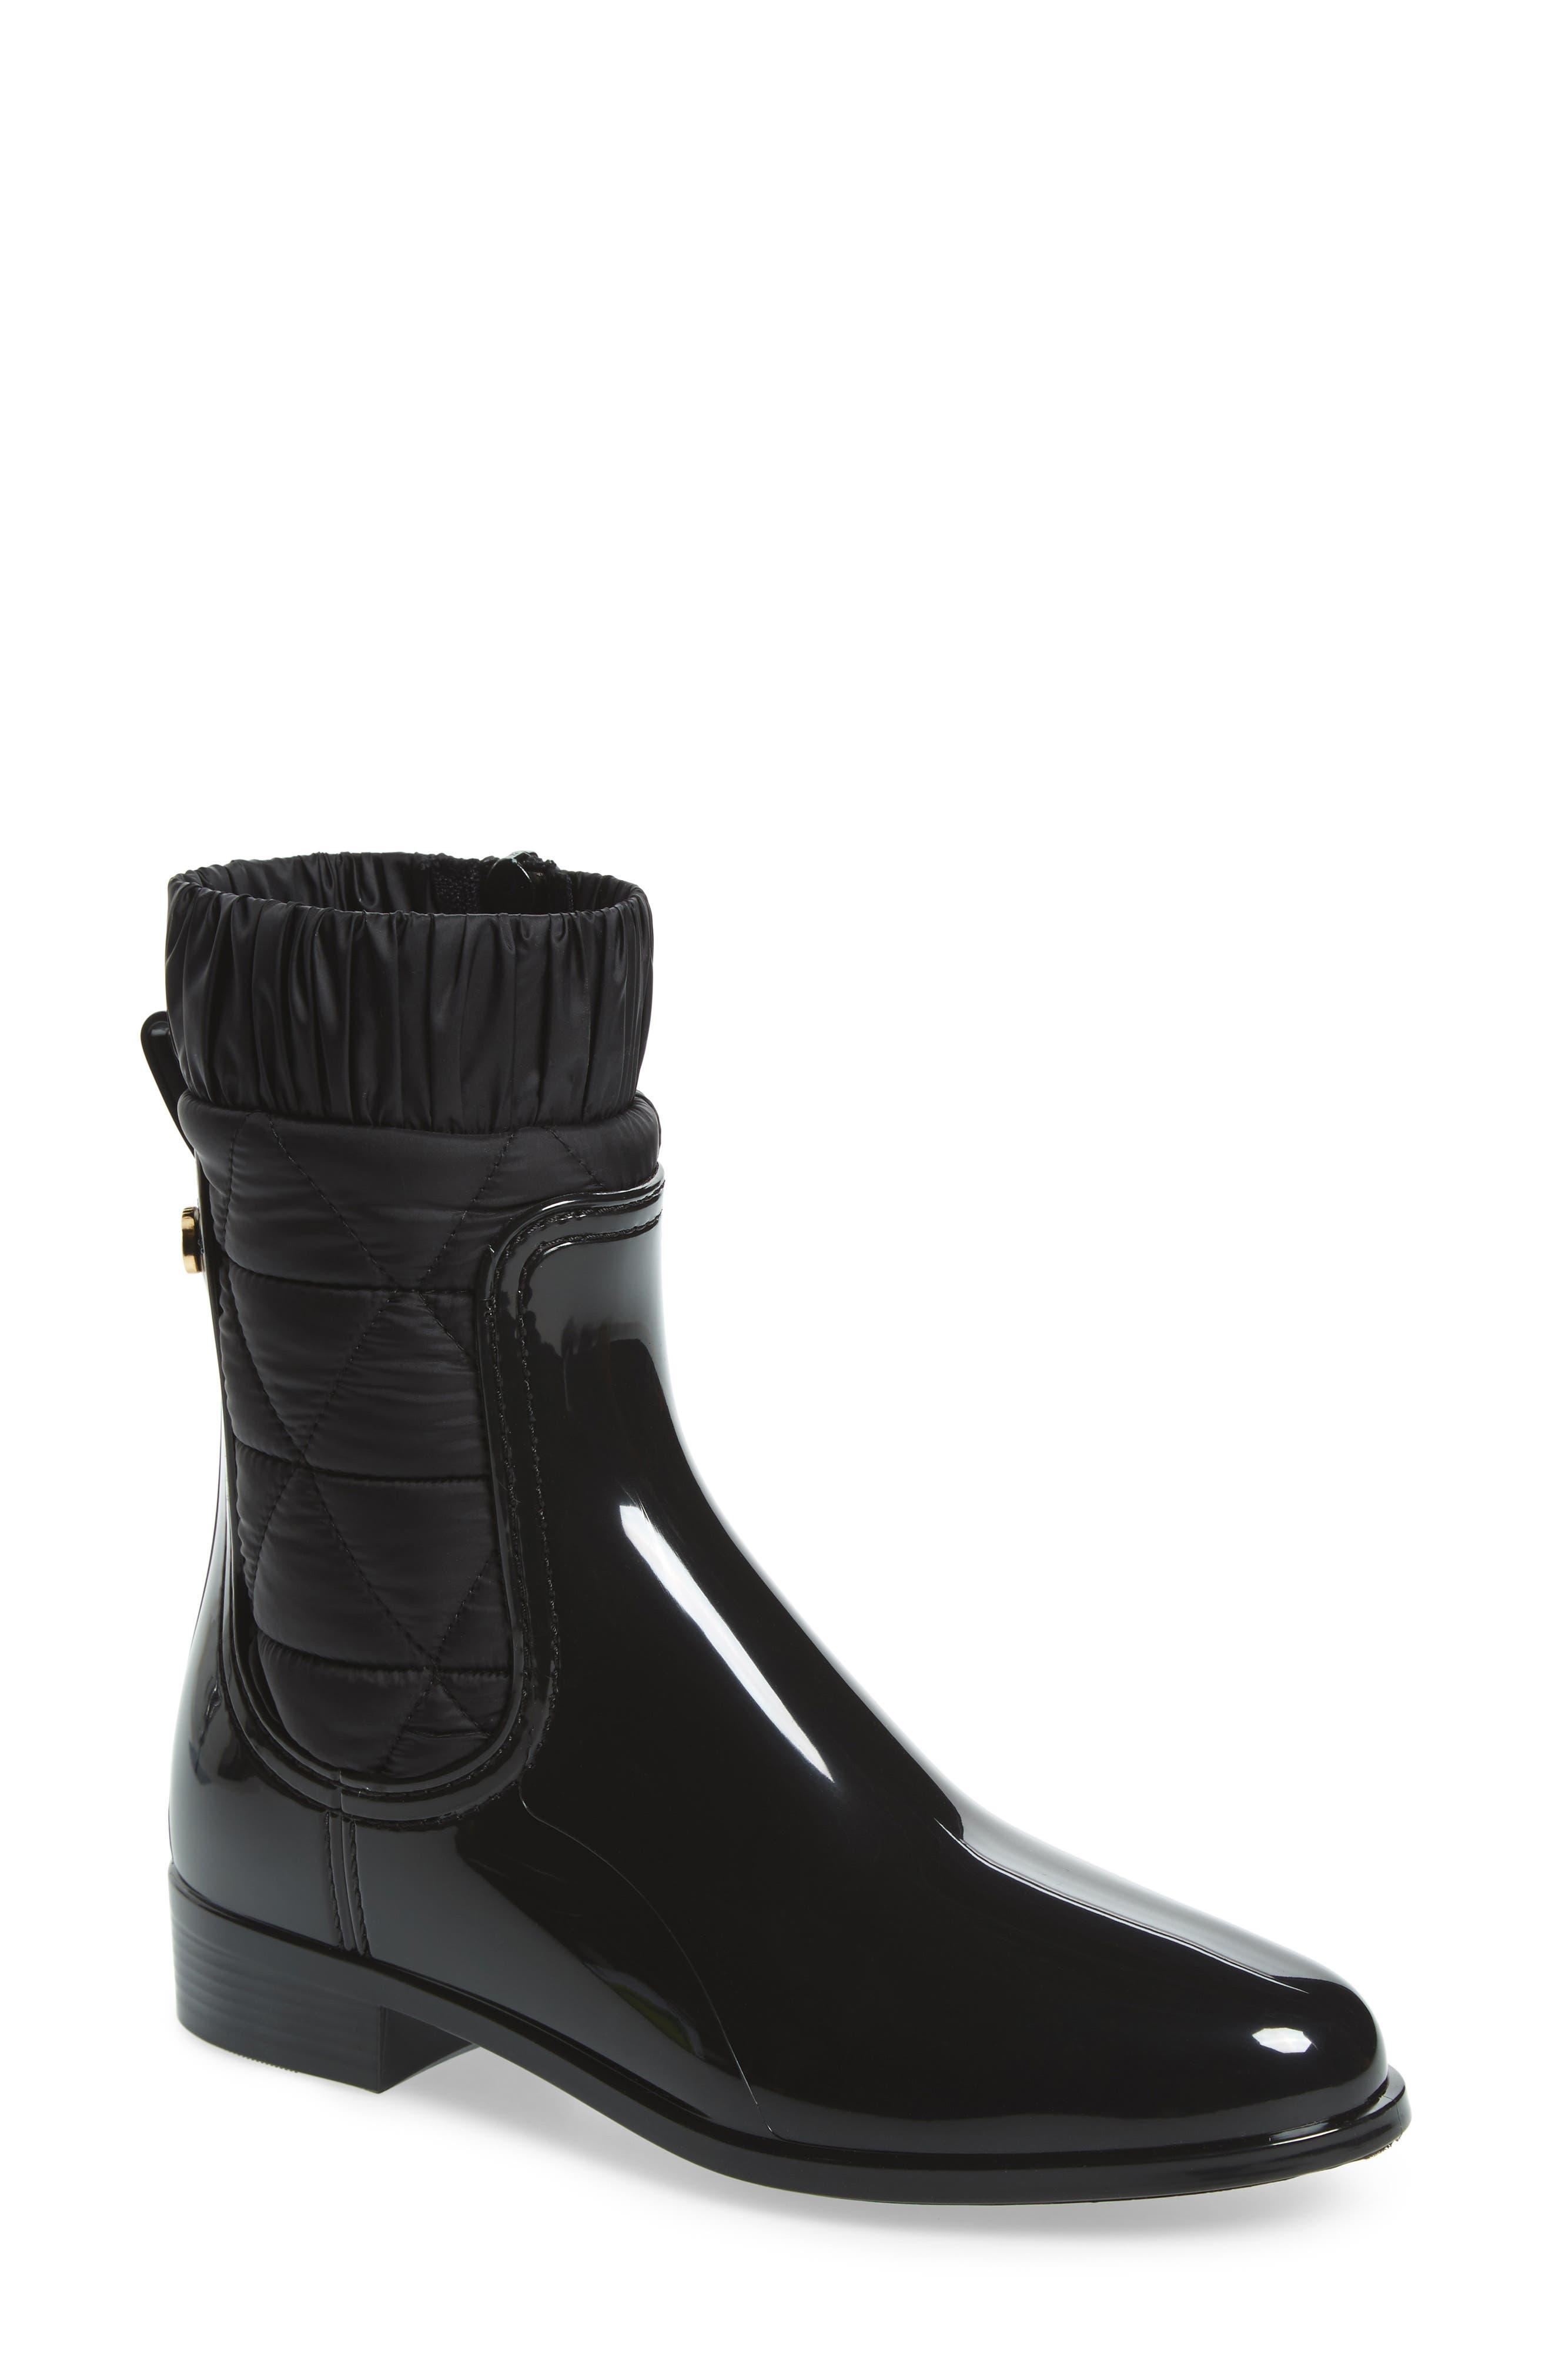 Adele Waterproof Boot,                             Main thumbnail 1, color,                             BLACK GLOSS